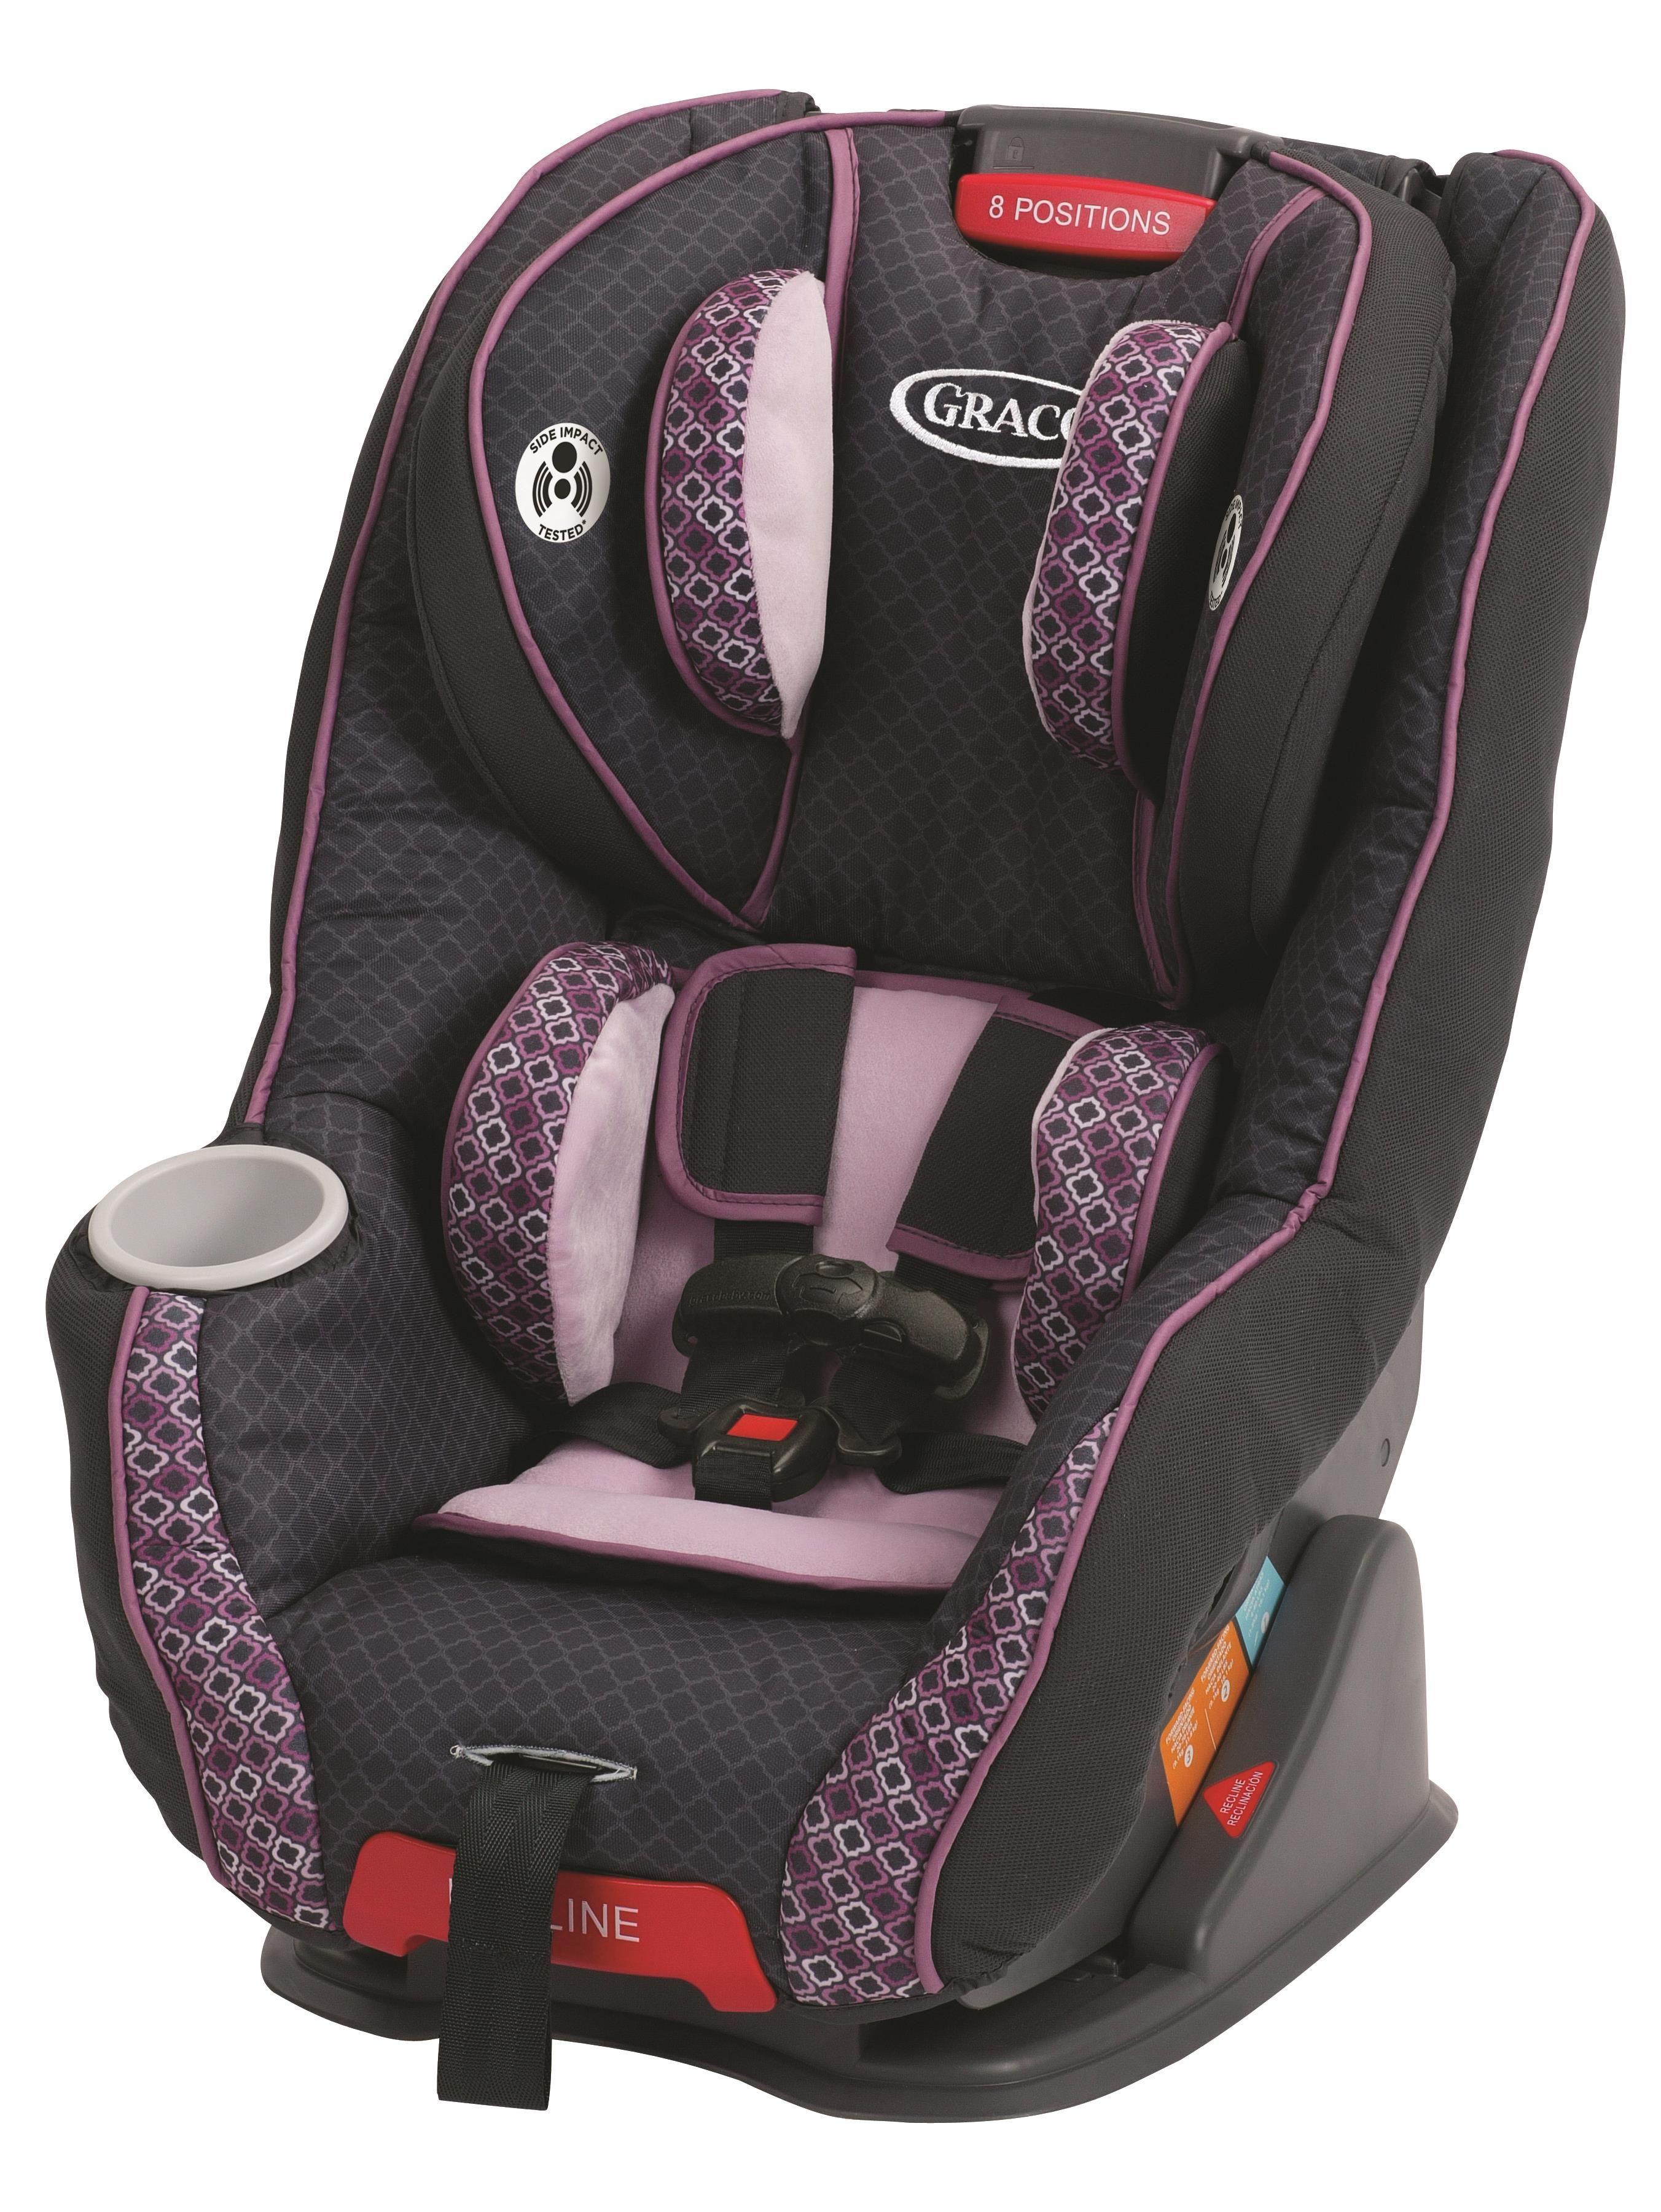 Graco MySize 65 Convertible Car Seat Reese Car seats